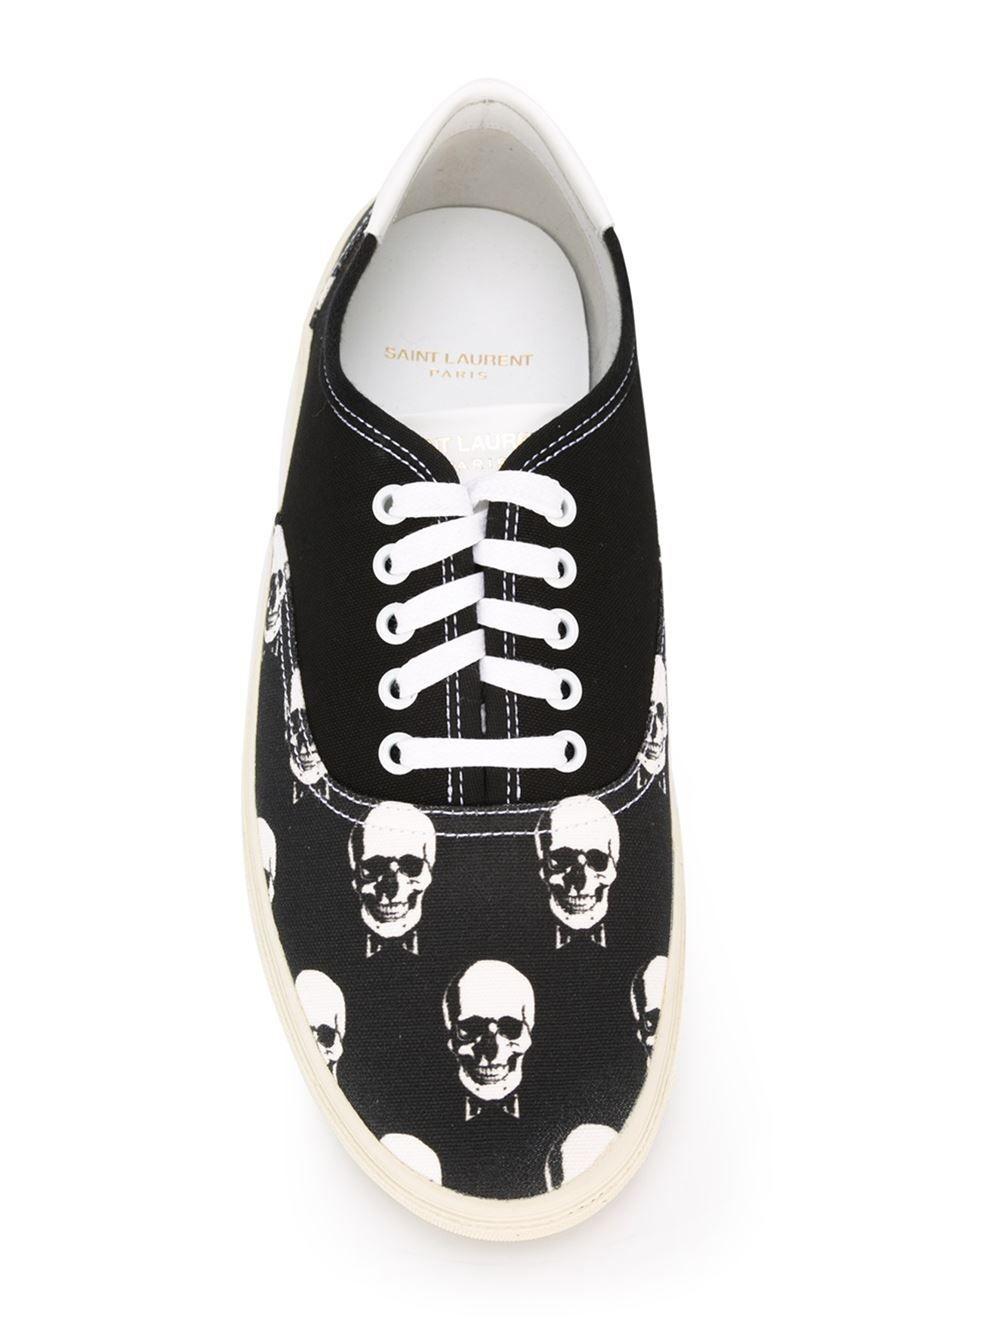 1c2a6ed1b1f Saint Laurent 'skate' Sneakers - Vitkac - Farfetch.com | Shoes ...